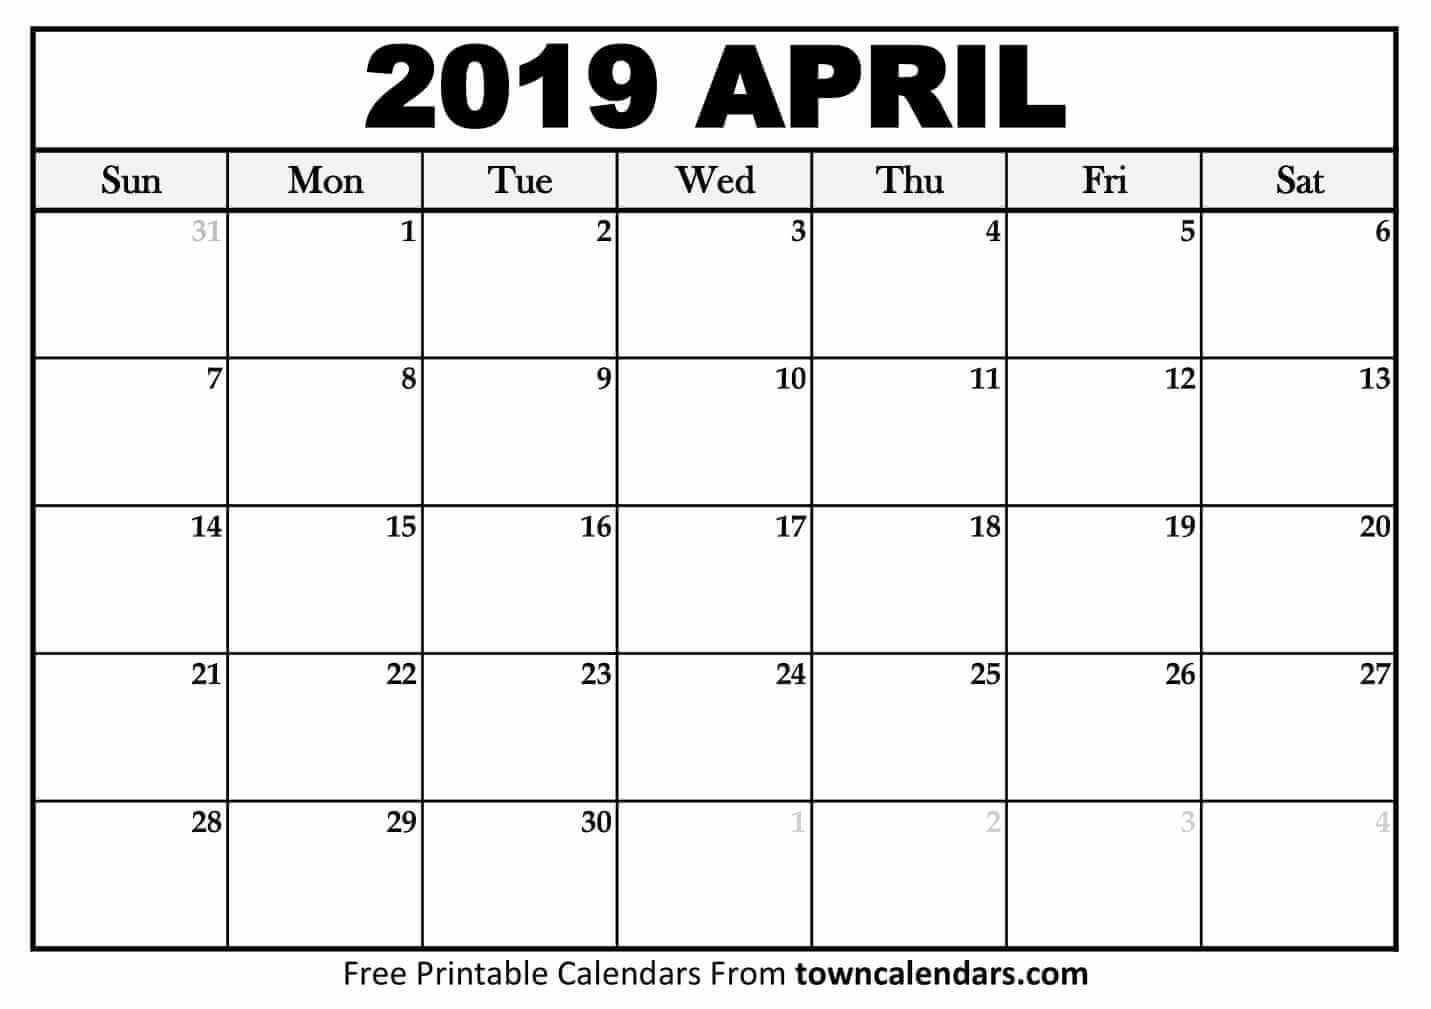 Printable April 2019 Calendar – Towncalendars Calendar 2019 April Printable